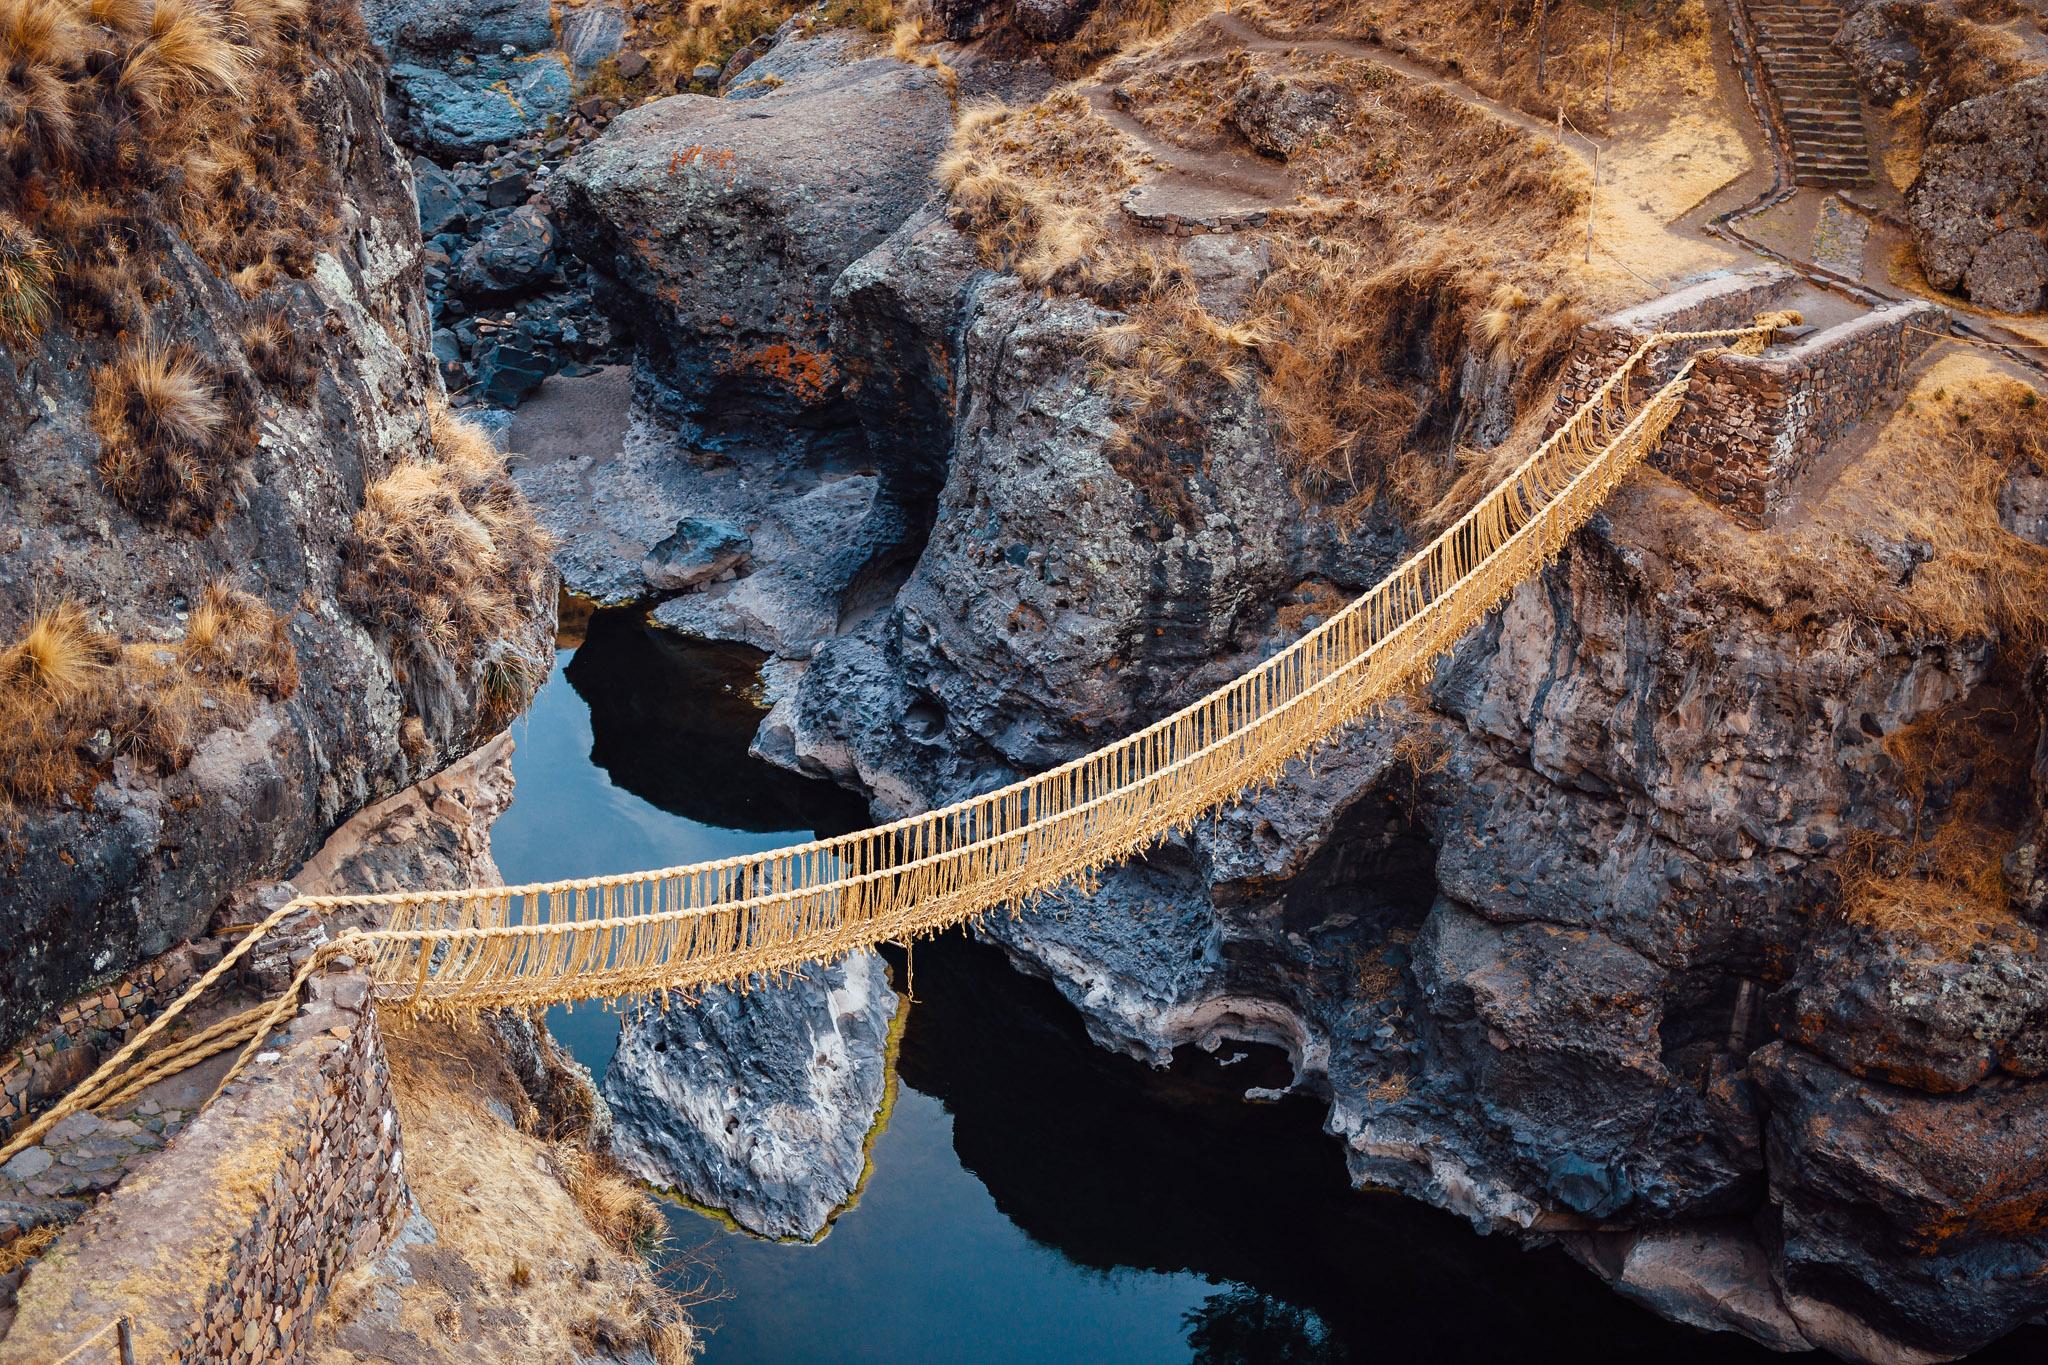 travel-photography-overlanding-apurimac-valley-peru-queswachaka-last-inca-bridge-8.jpg